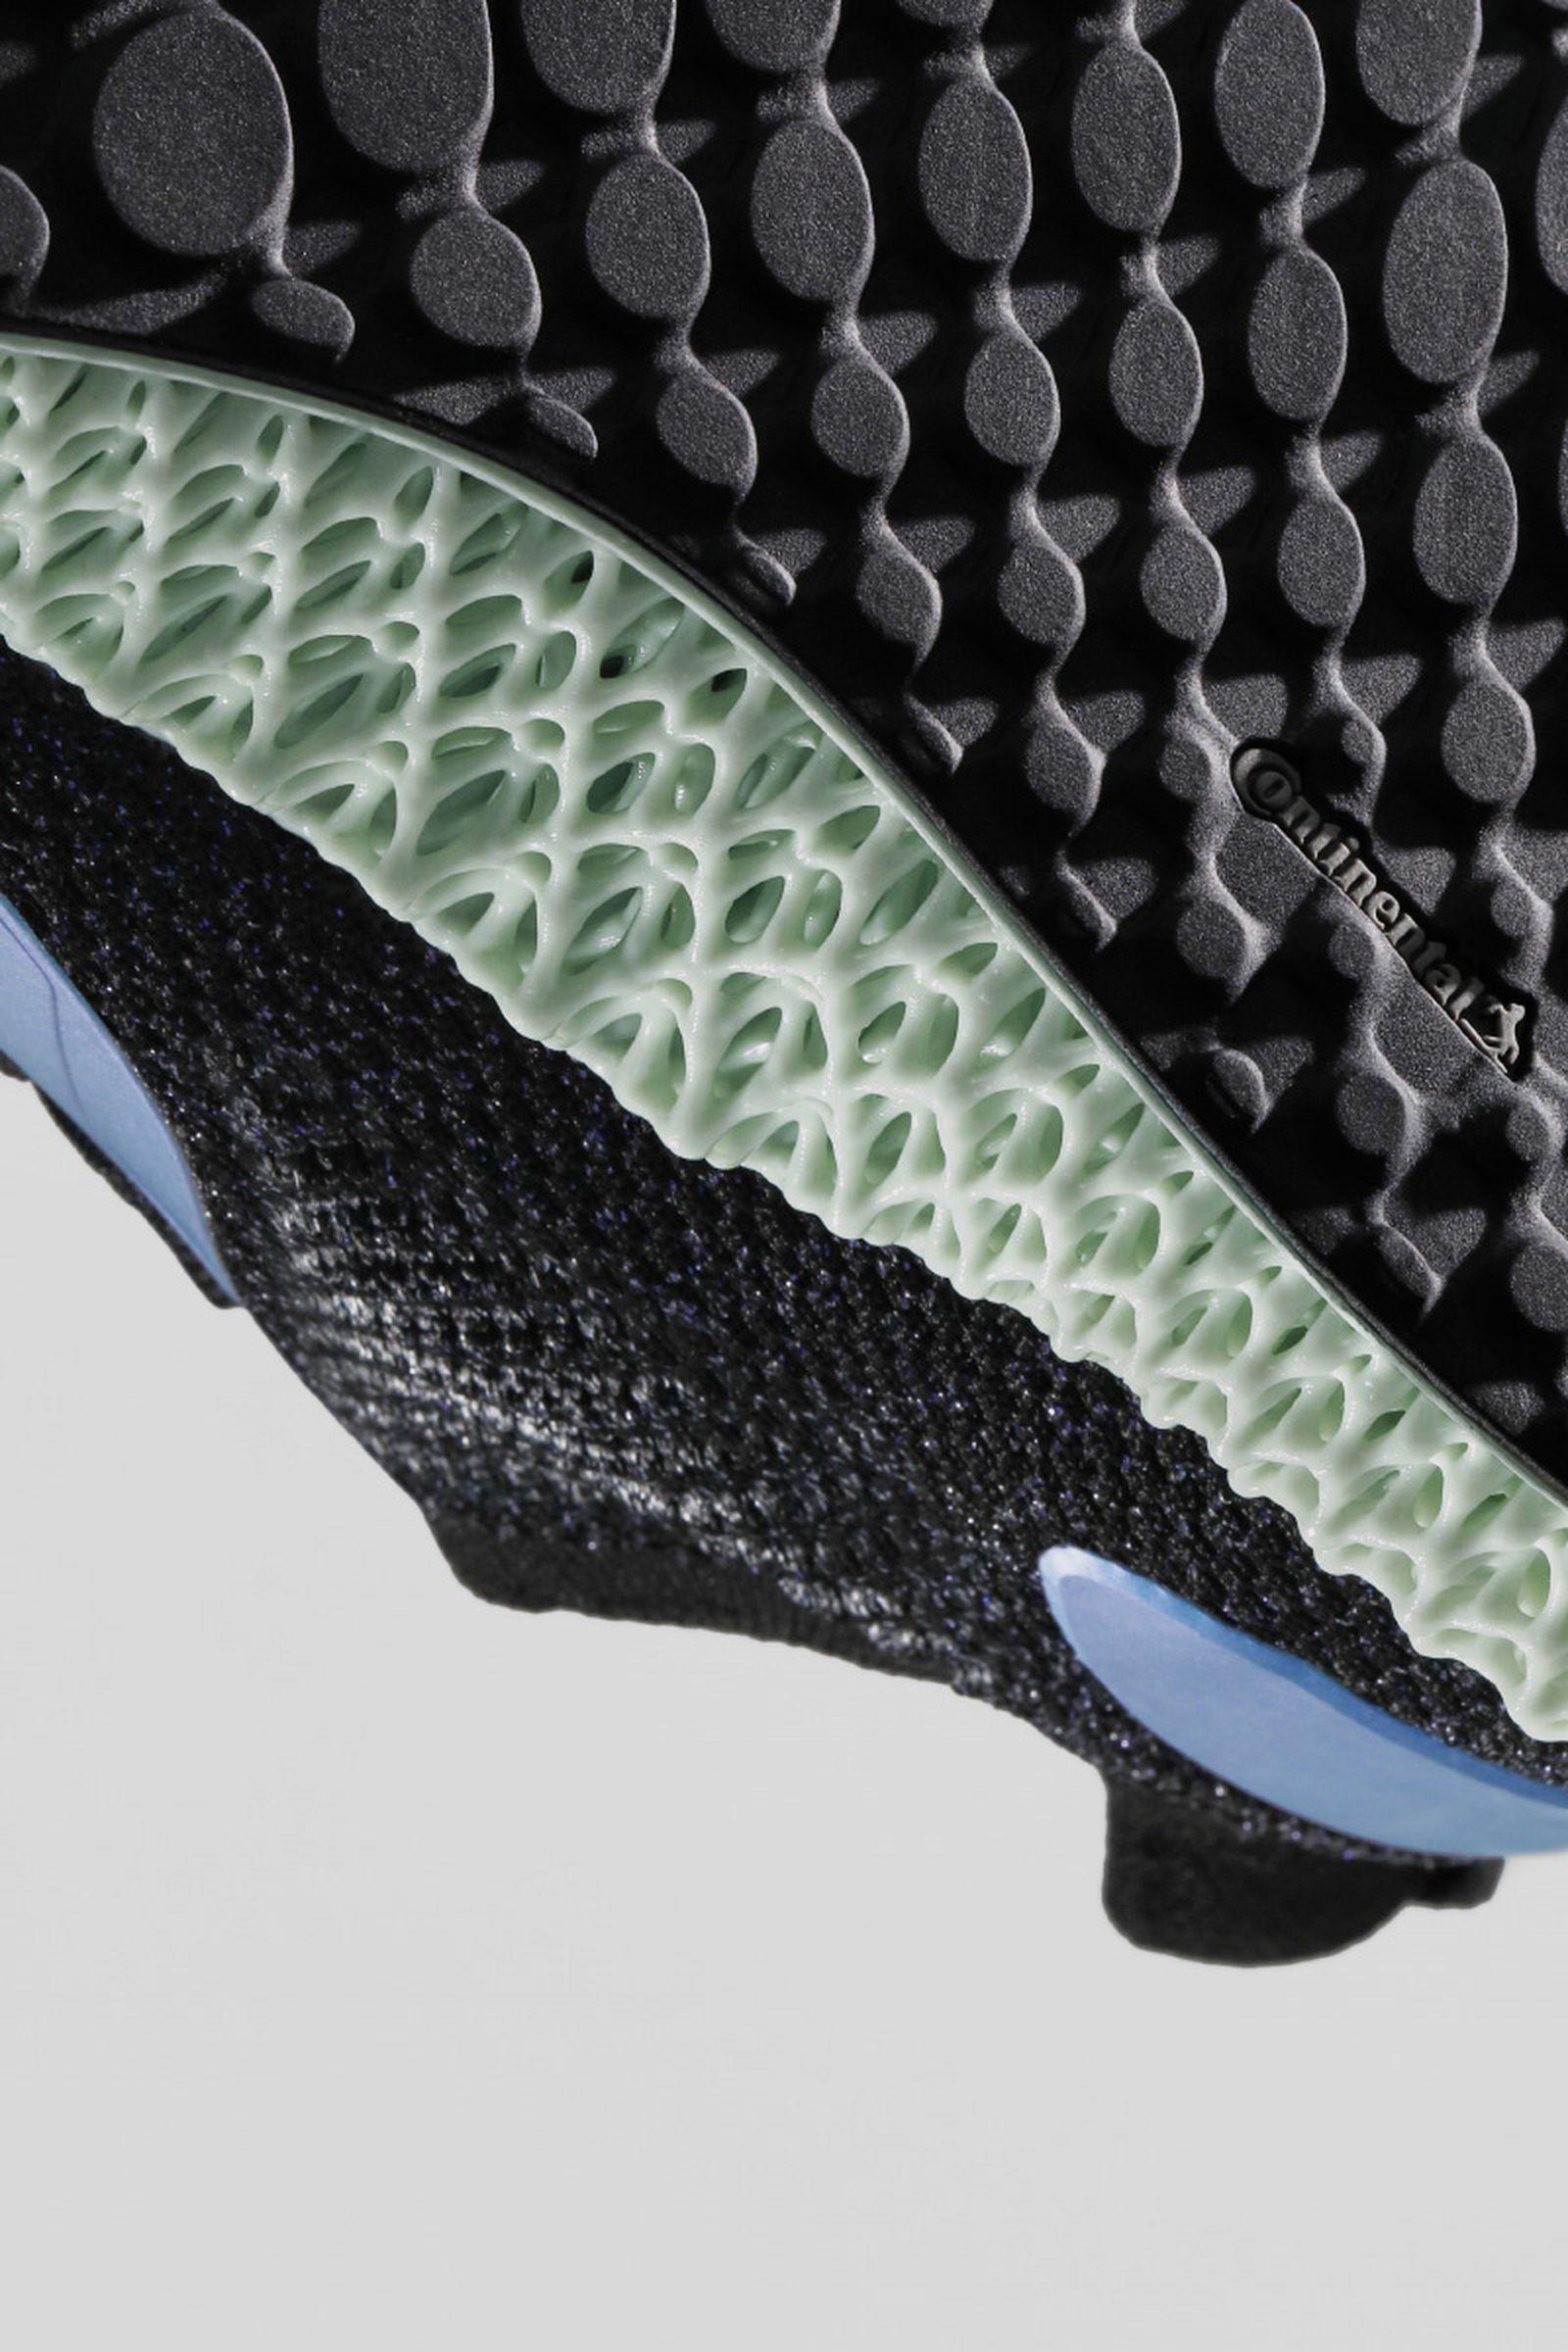 adidas-alphaedge-4d-goodbye-gravity-07